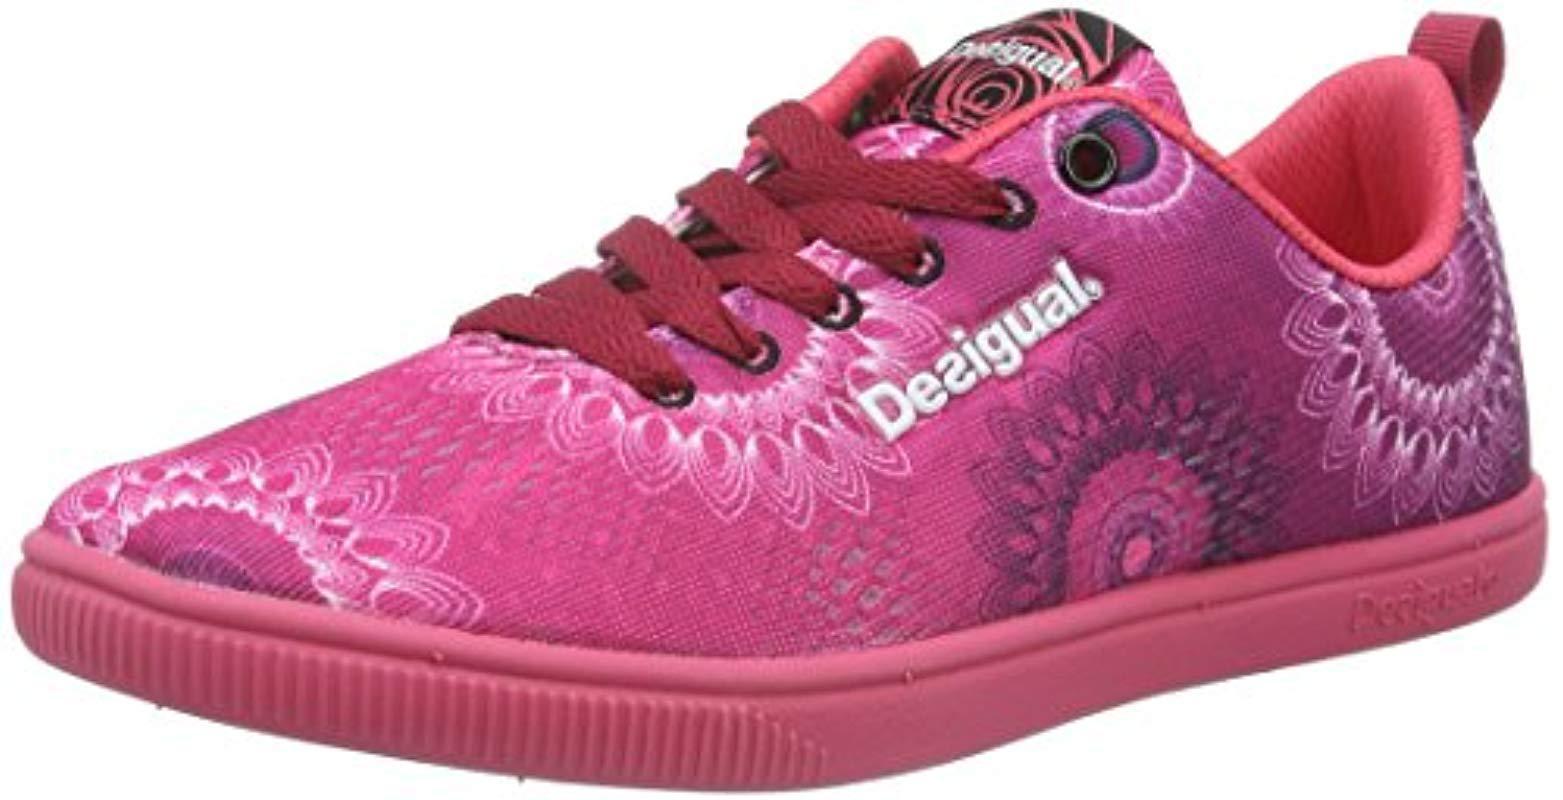 Desigual scarpe candem Lyst B, 's Fitness scarpe in rosa Lyst candem fbf384